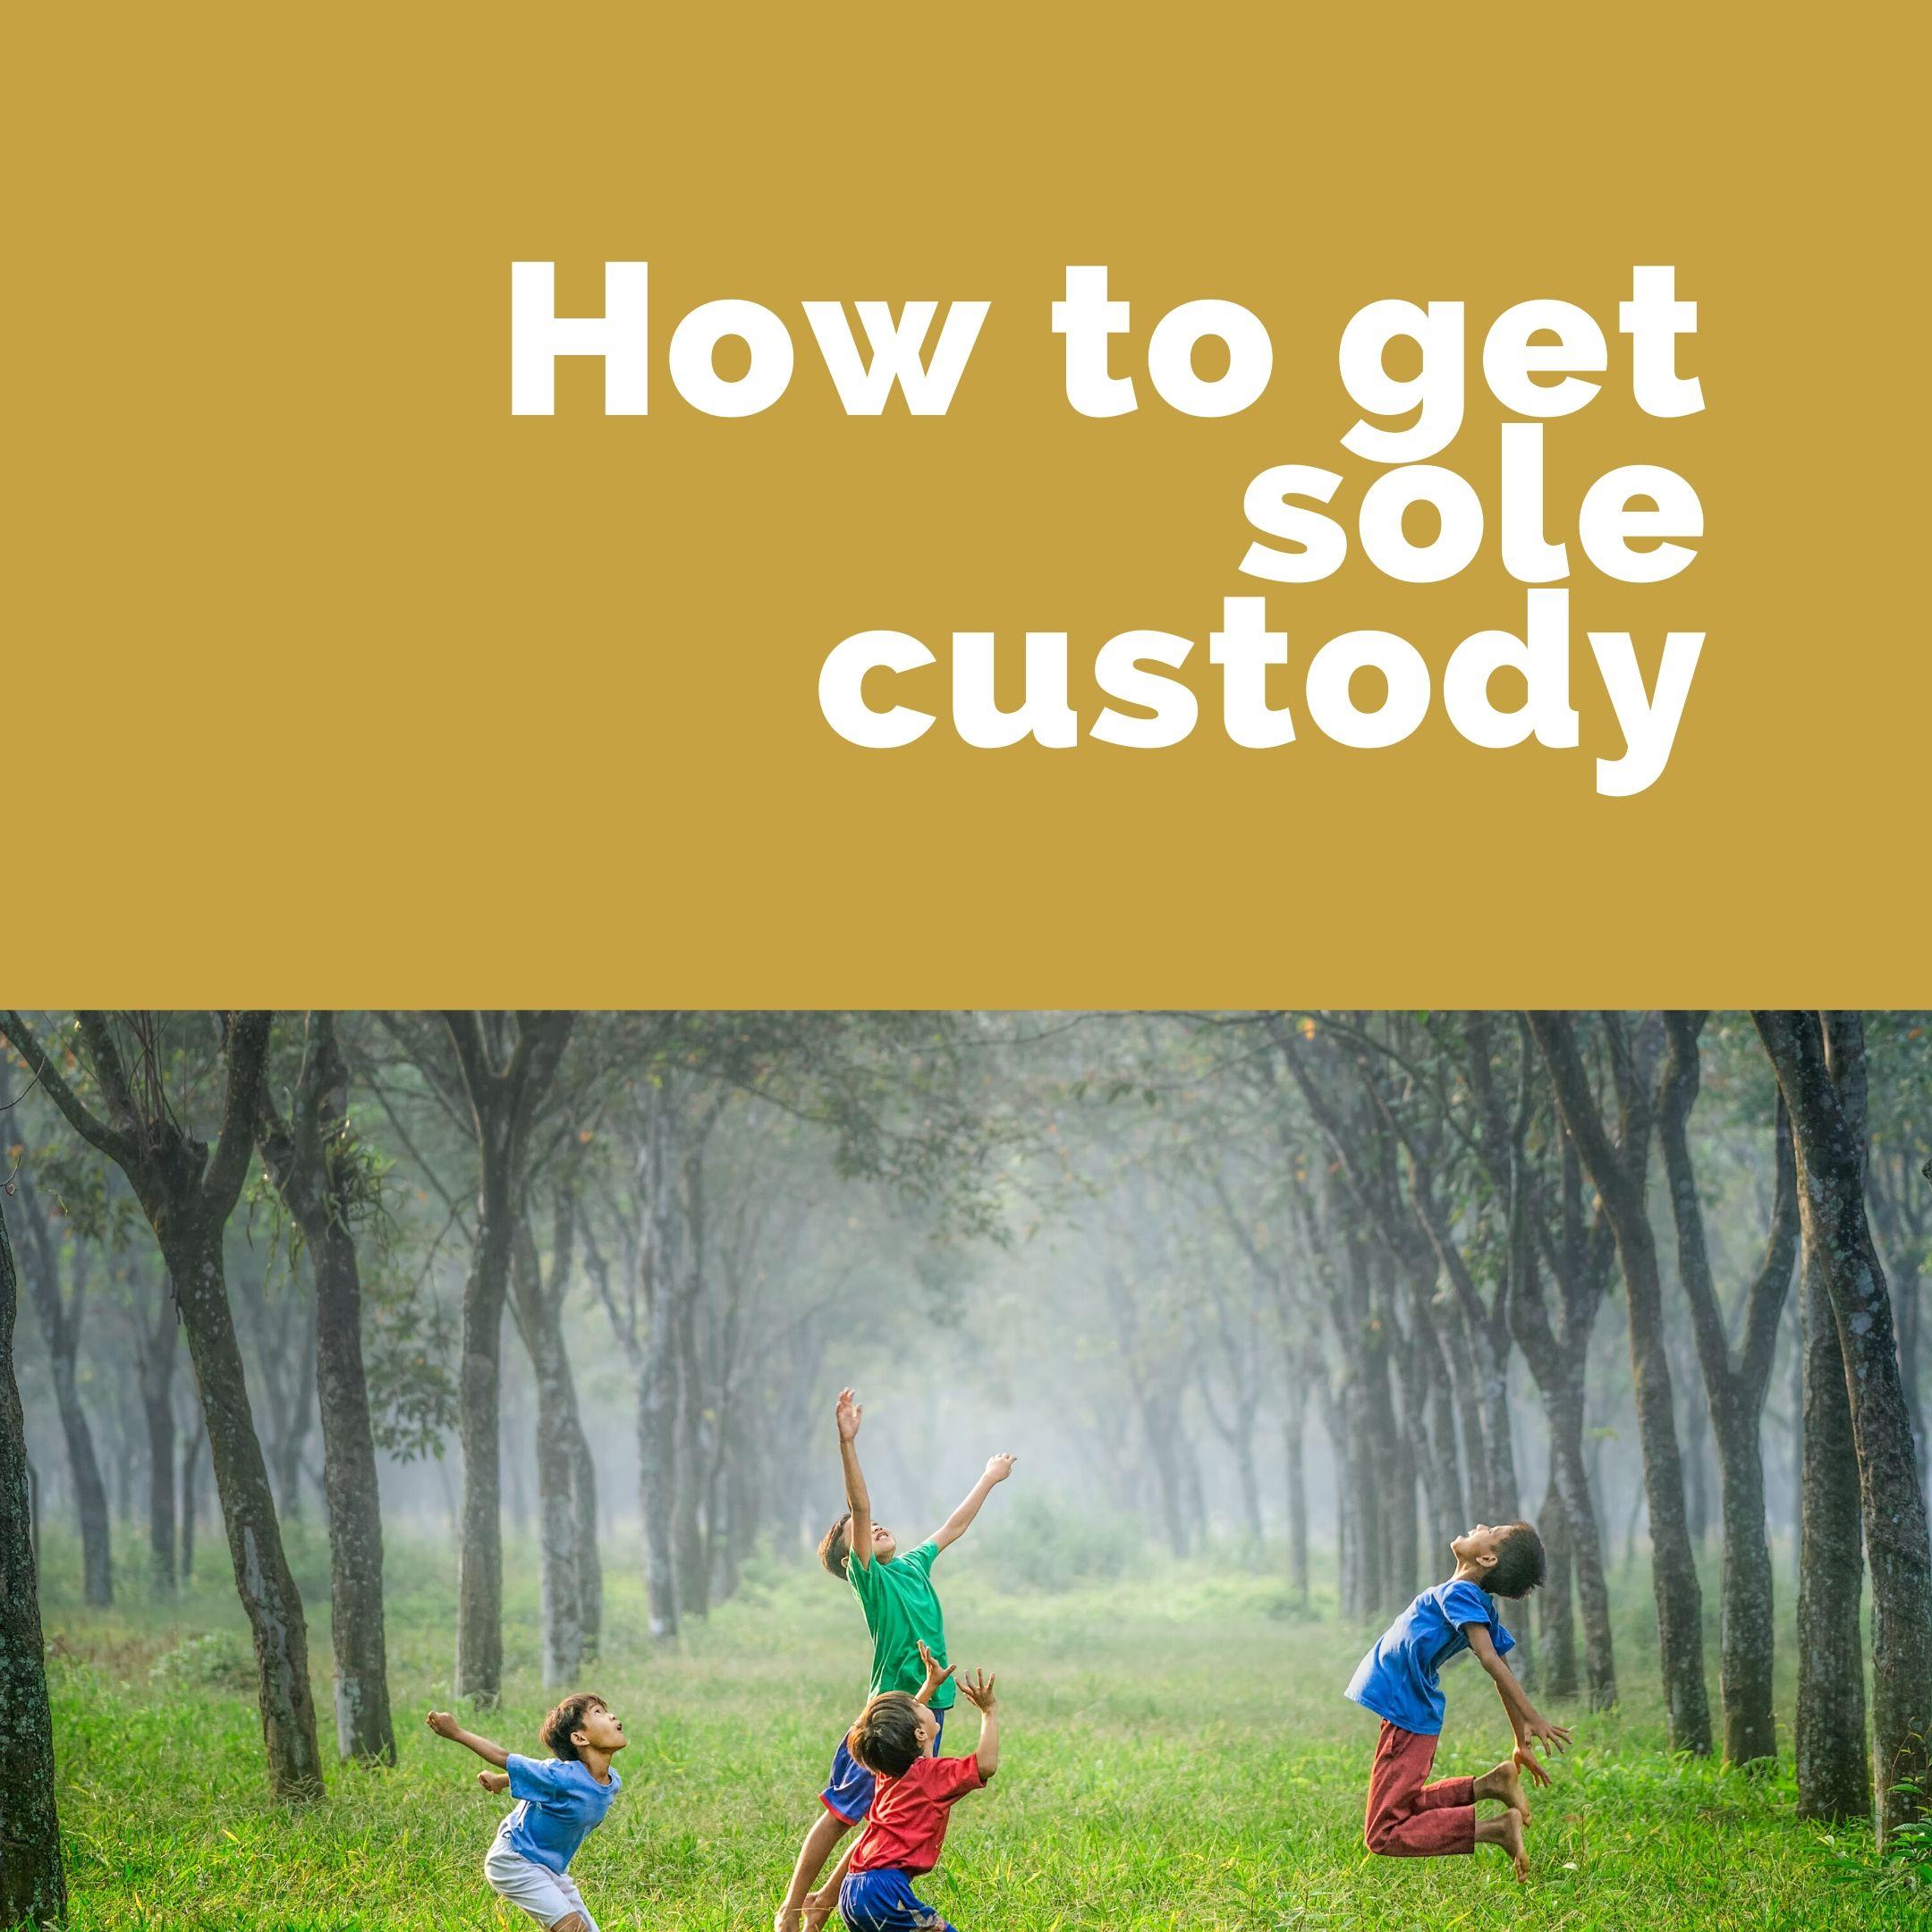 How Do You Get Sole Custody?